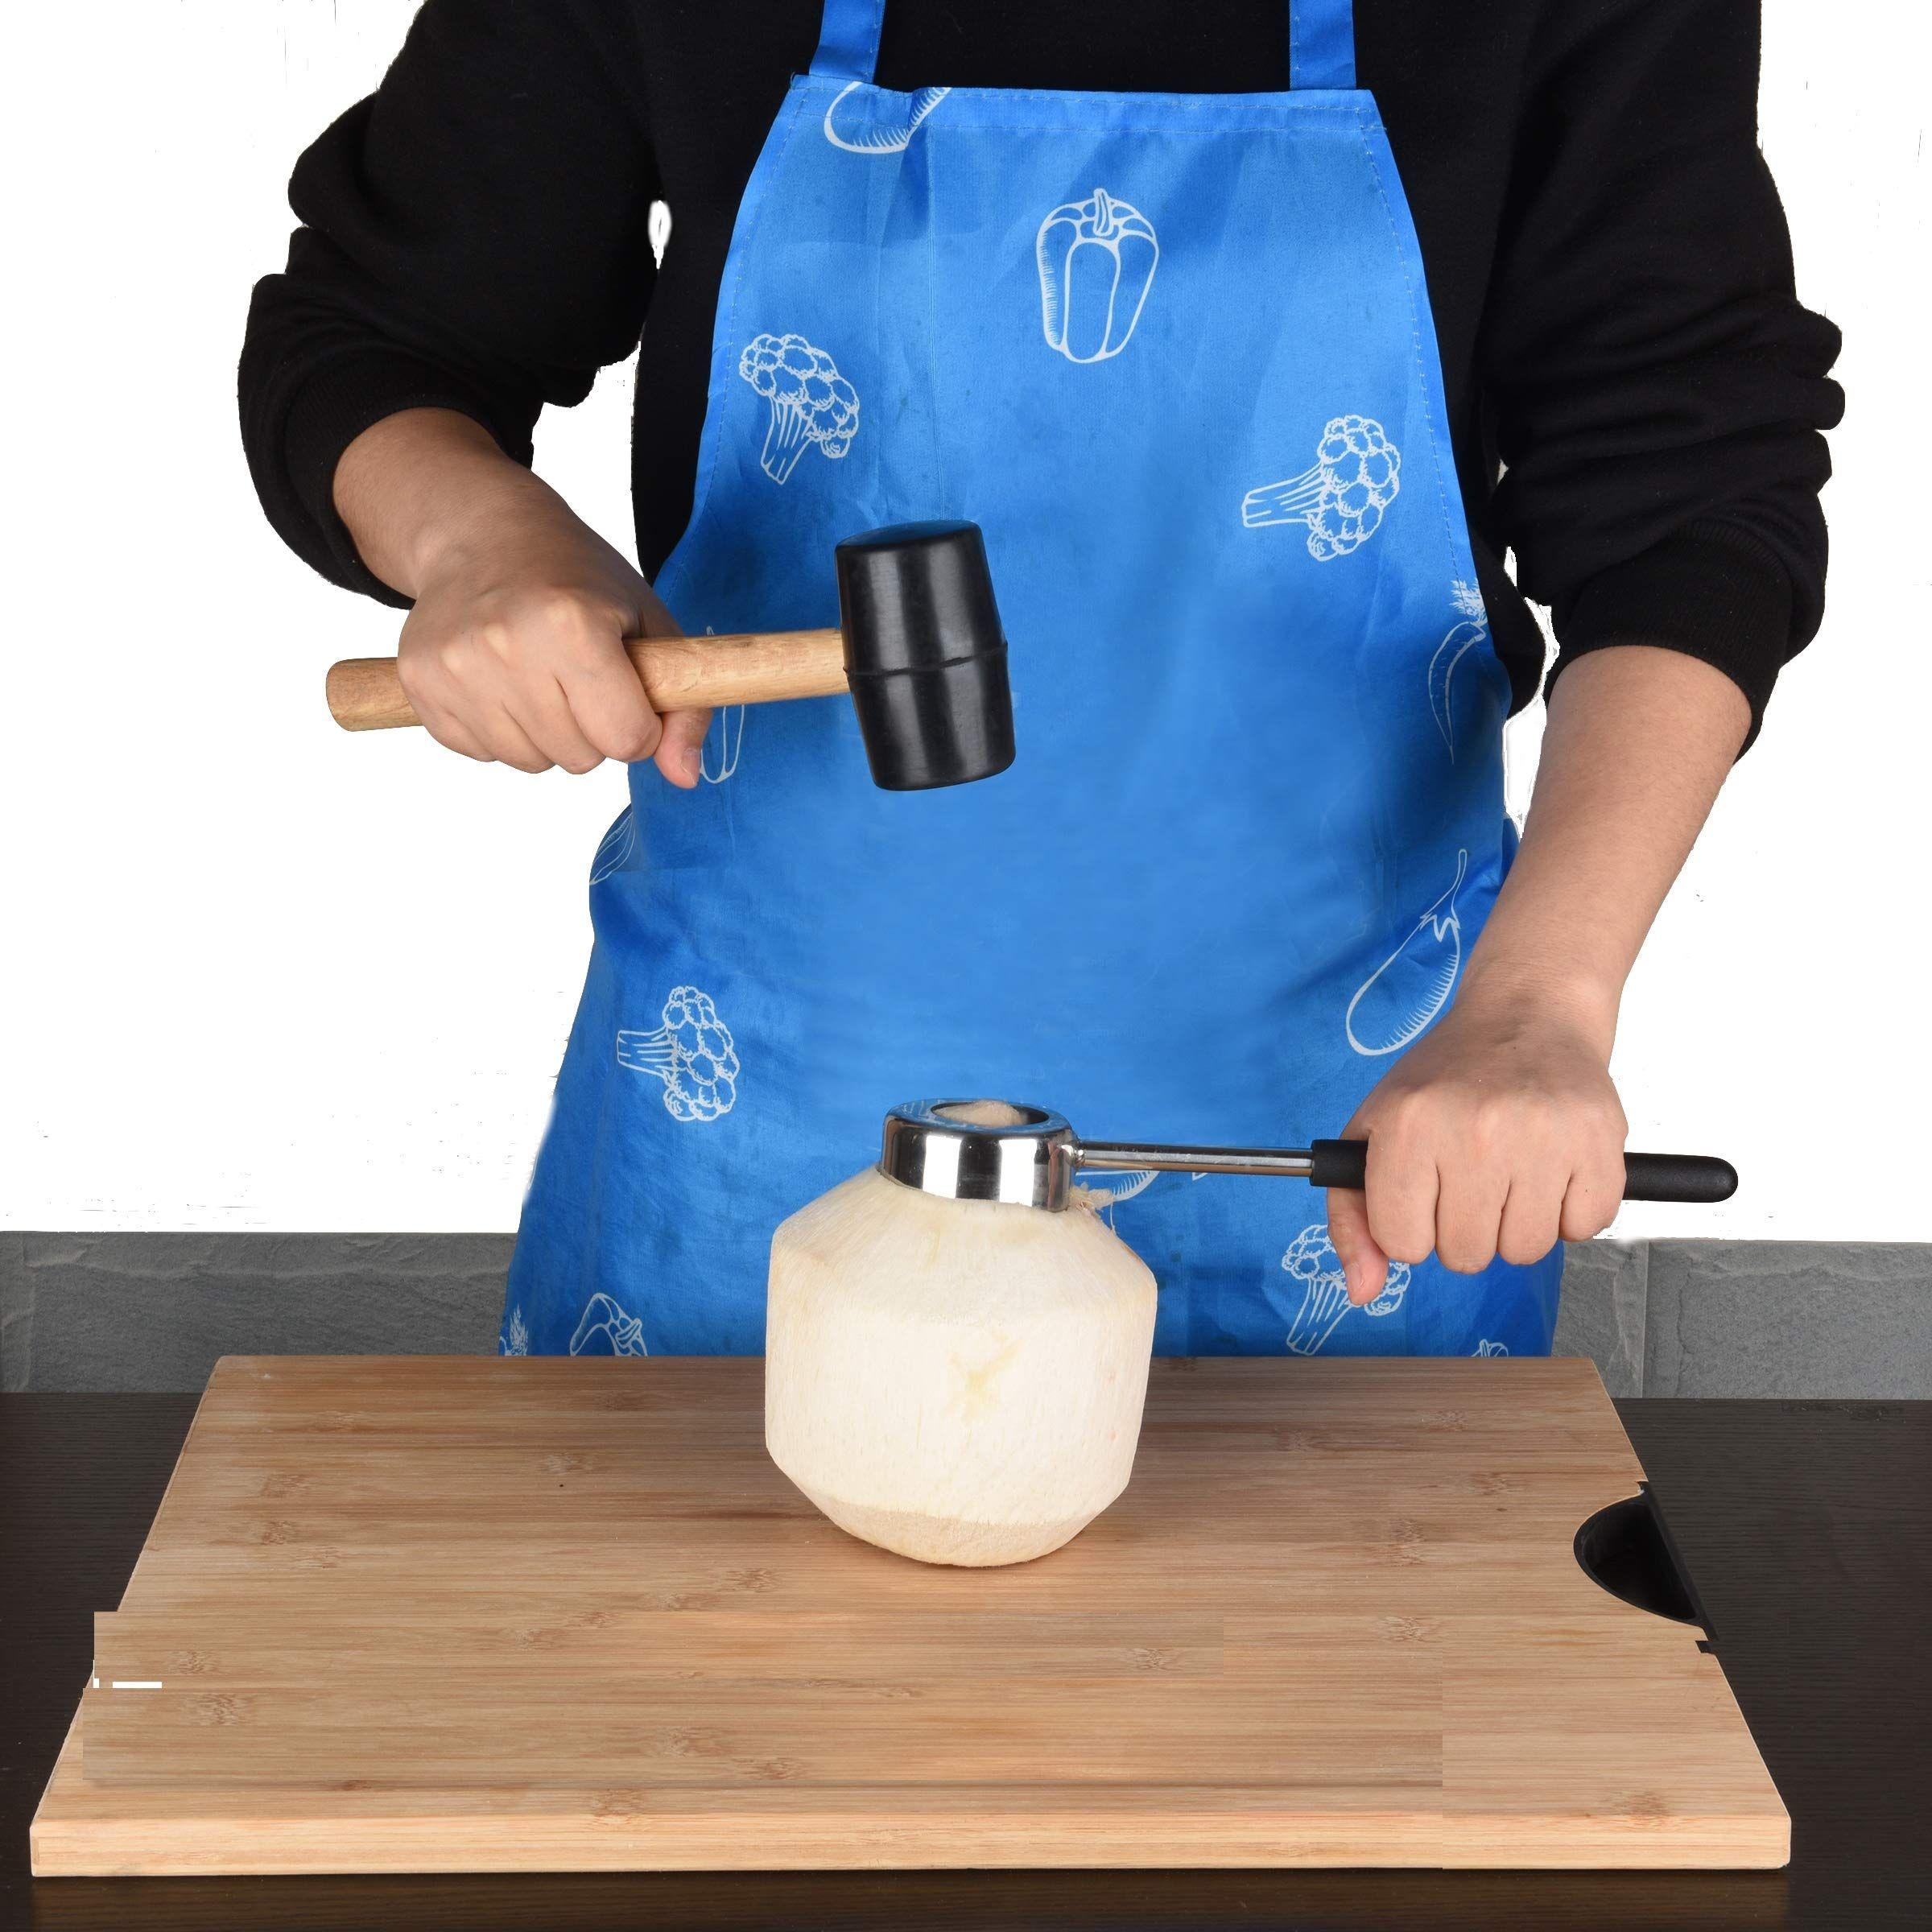 silva coconut opener with safety grip and hammer set bonus